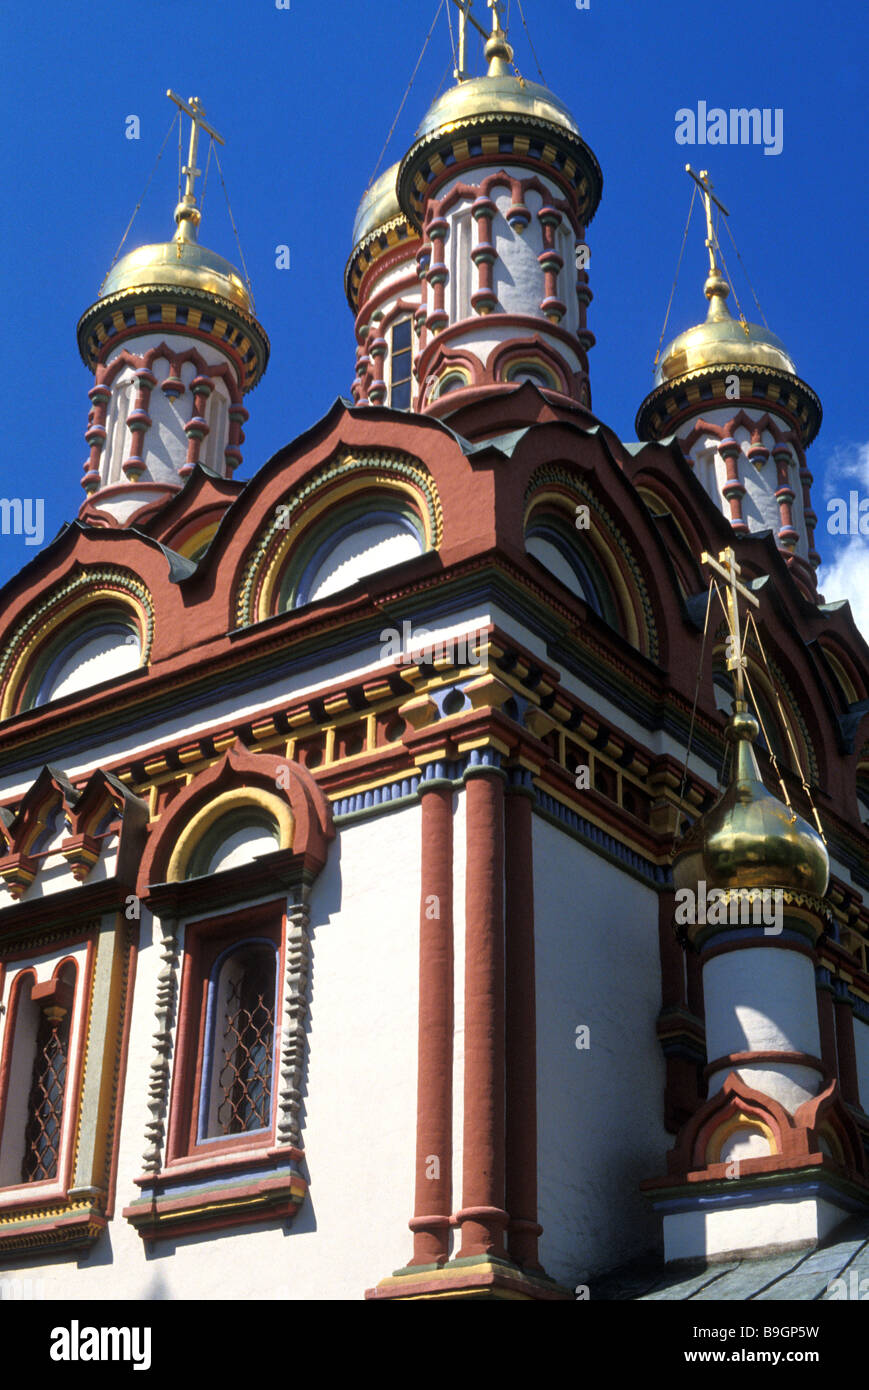 st nicholas church cupolas moscow russia - Stock Image